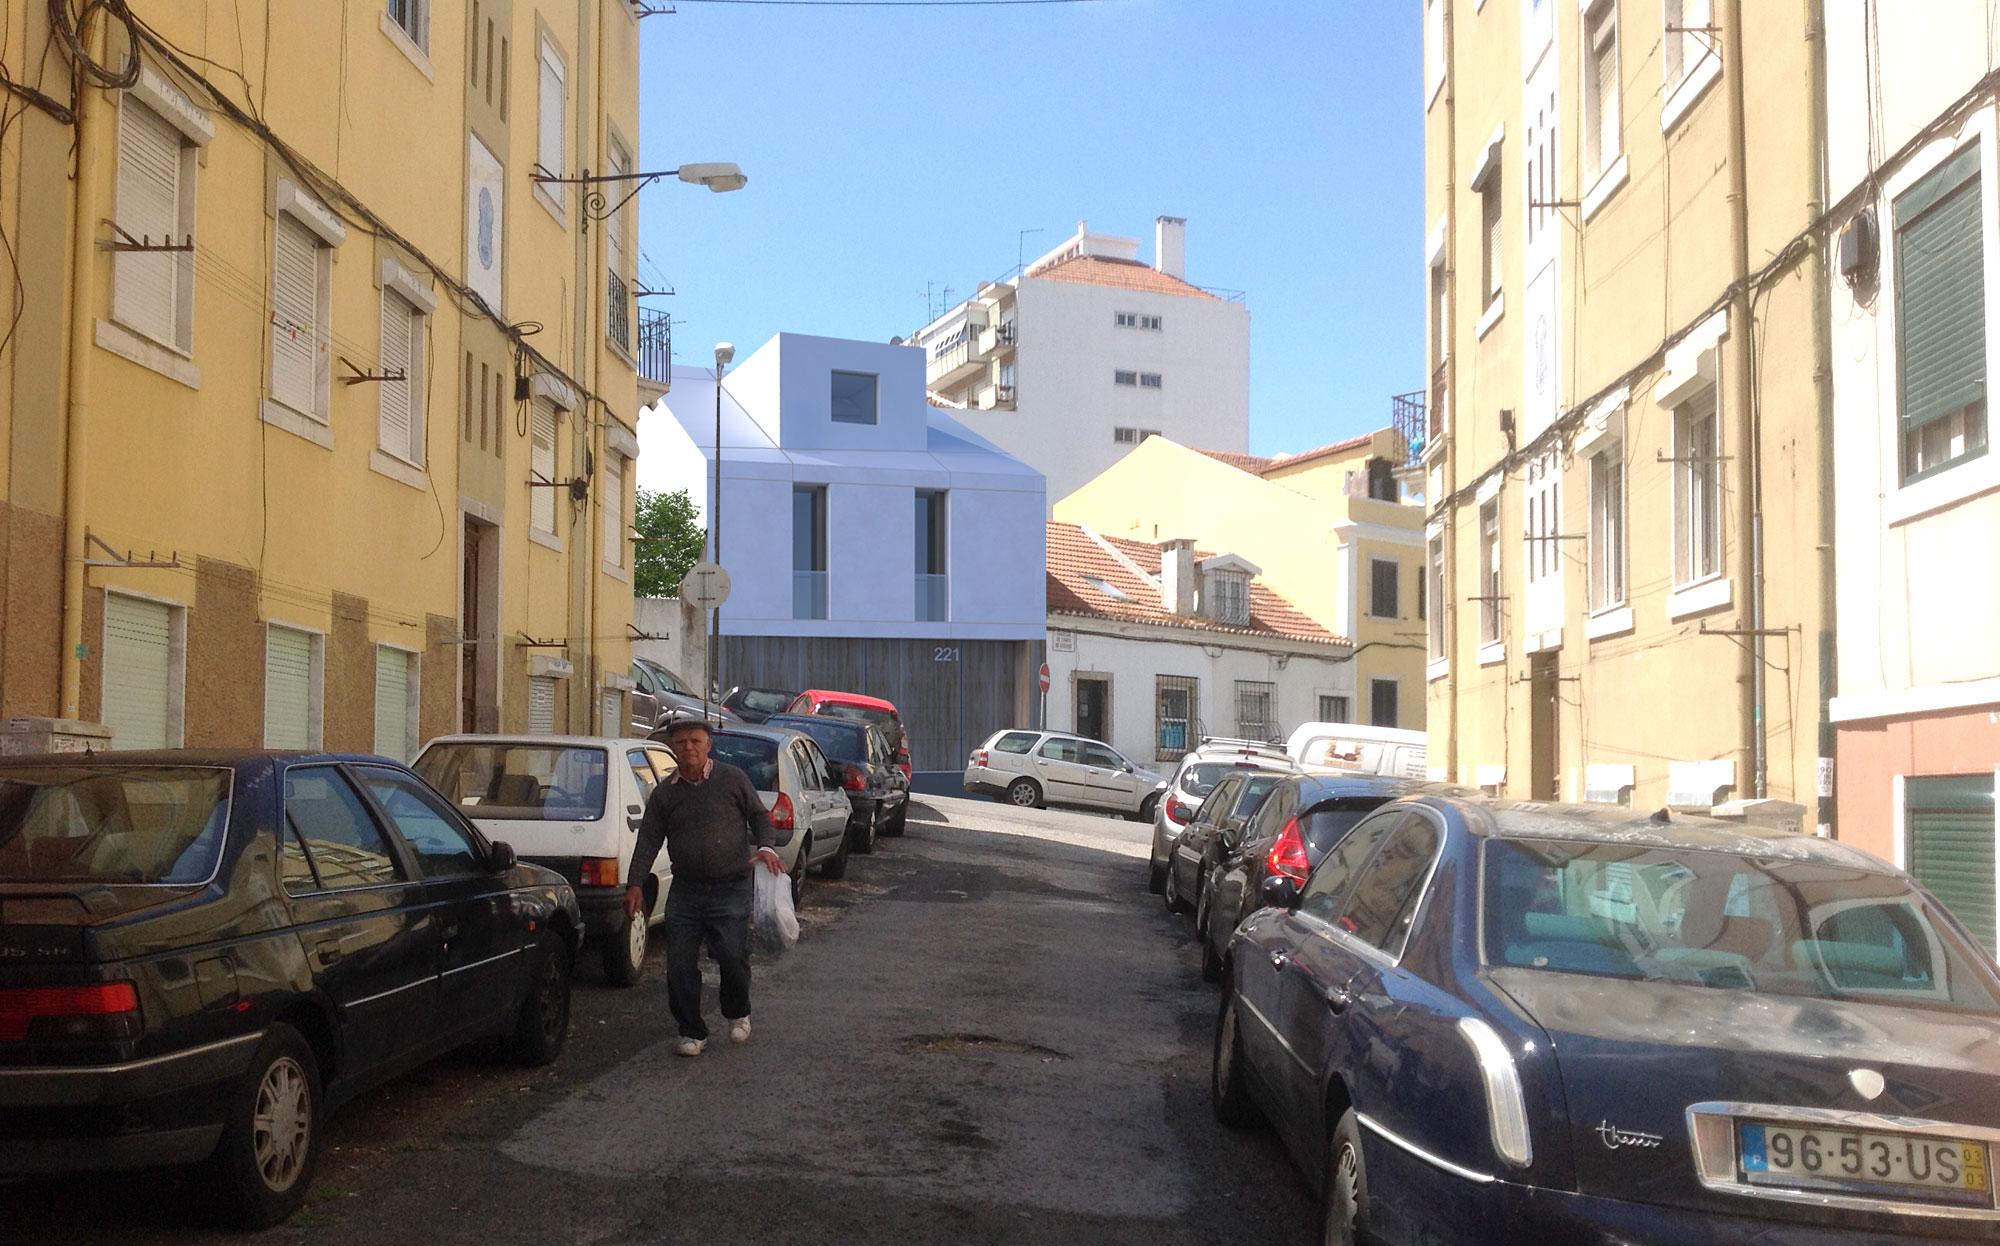 Moradia Arquitectura, Arquitecto Lisboa, Projecto arquitectura Lisboa, Arquitecto Lisboa, Arquitecto, Gabinete de Arquitetura Lisboa